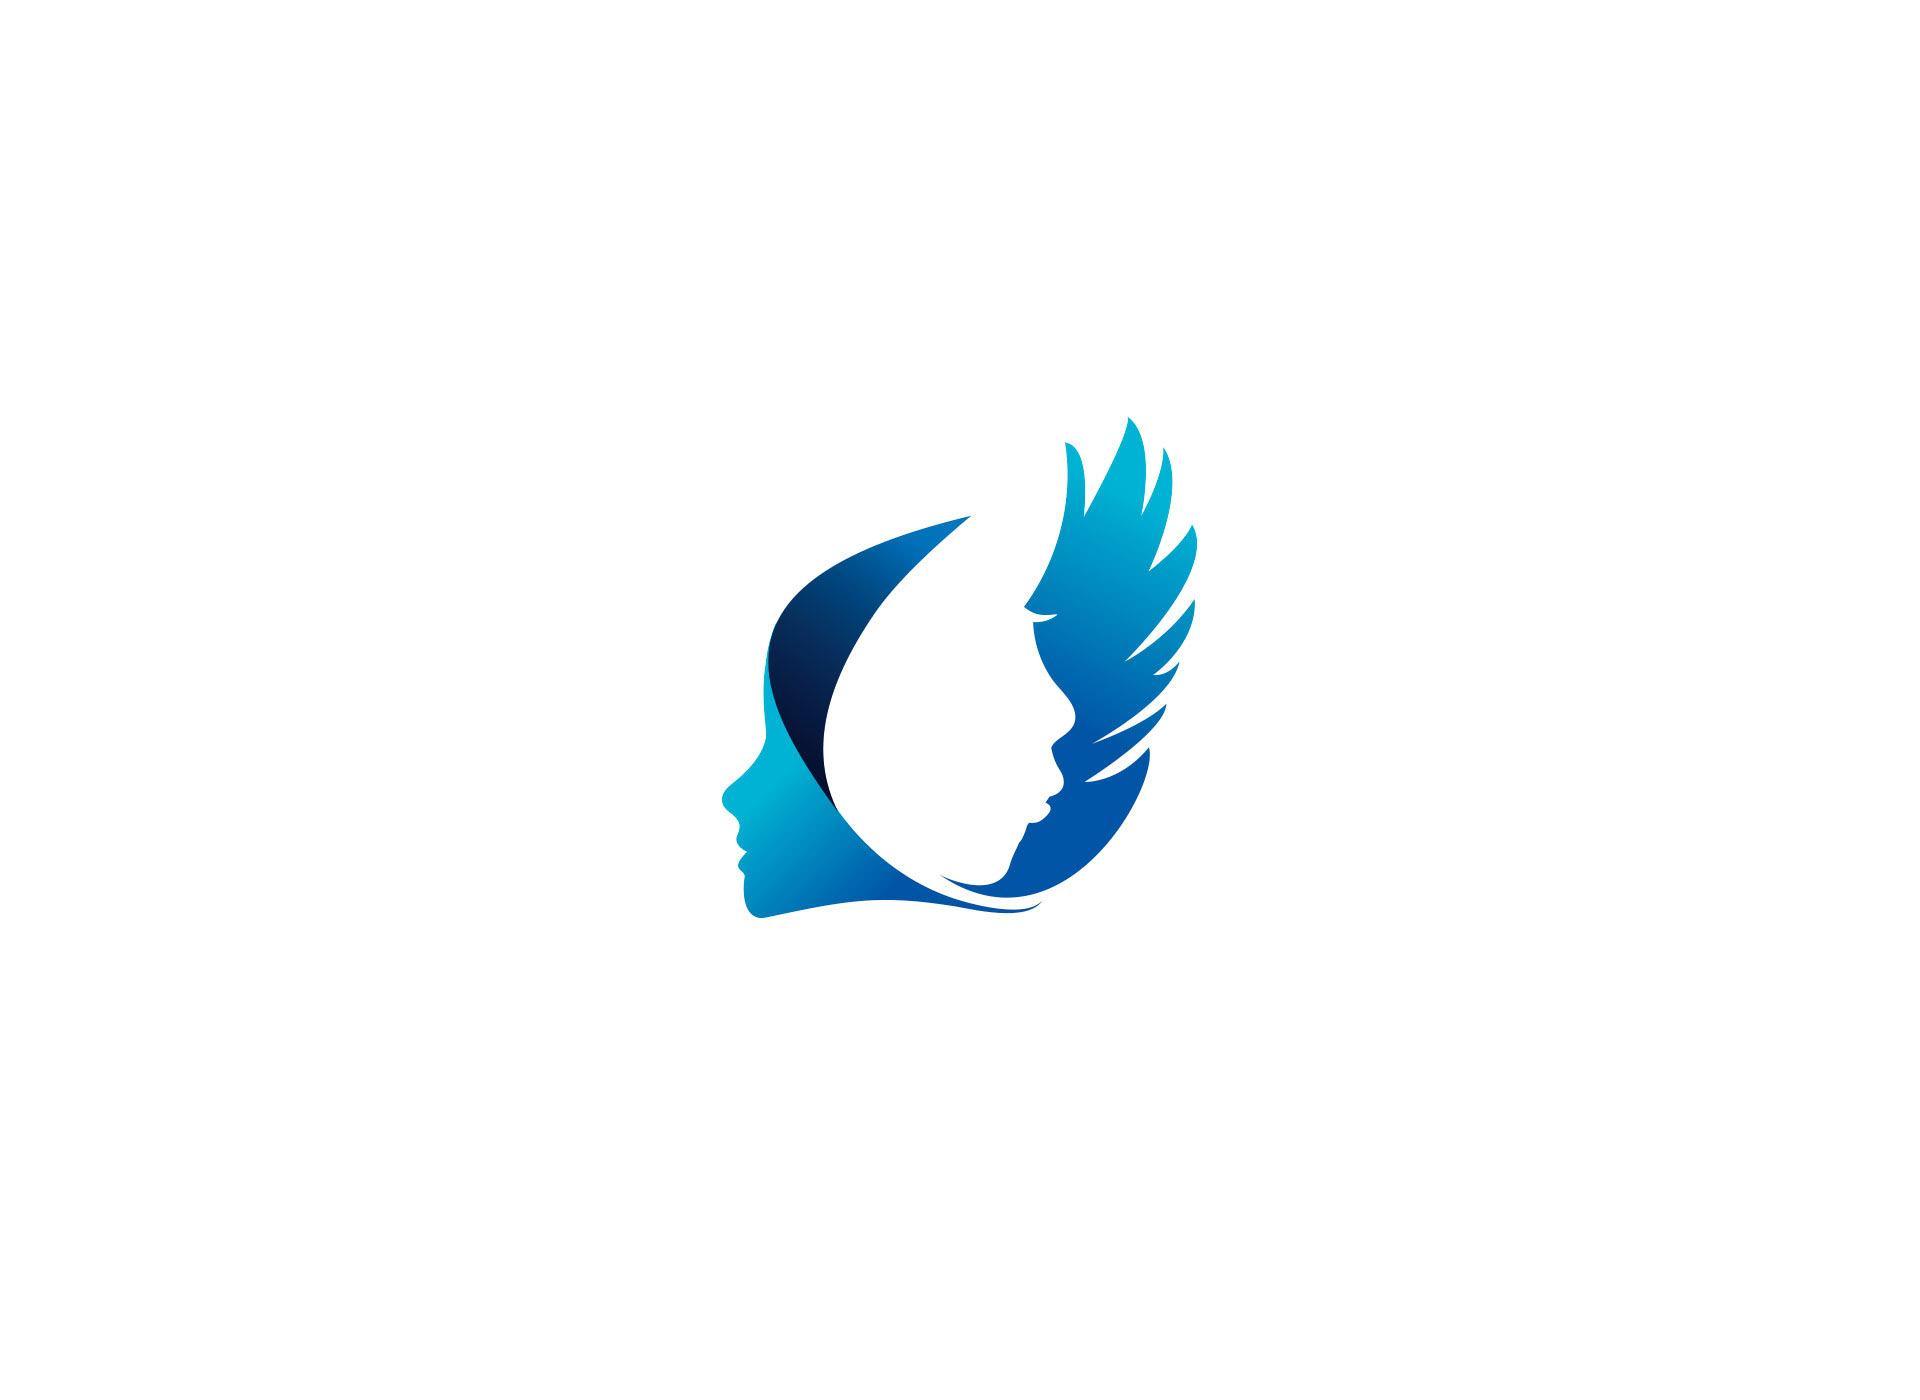 Logo design coaching עיצוב לוגו אימון עסקי